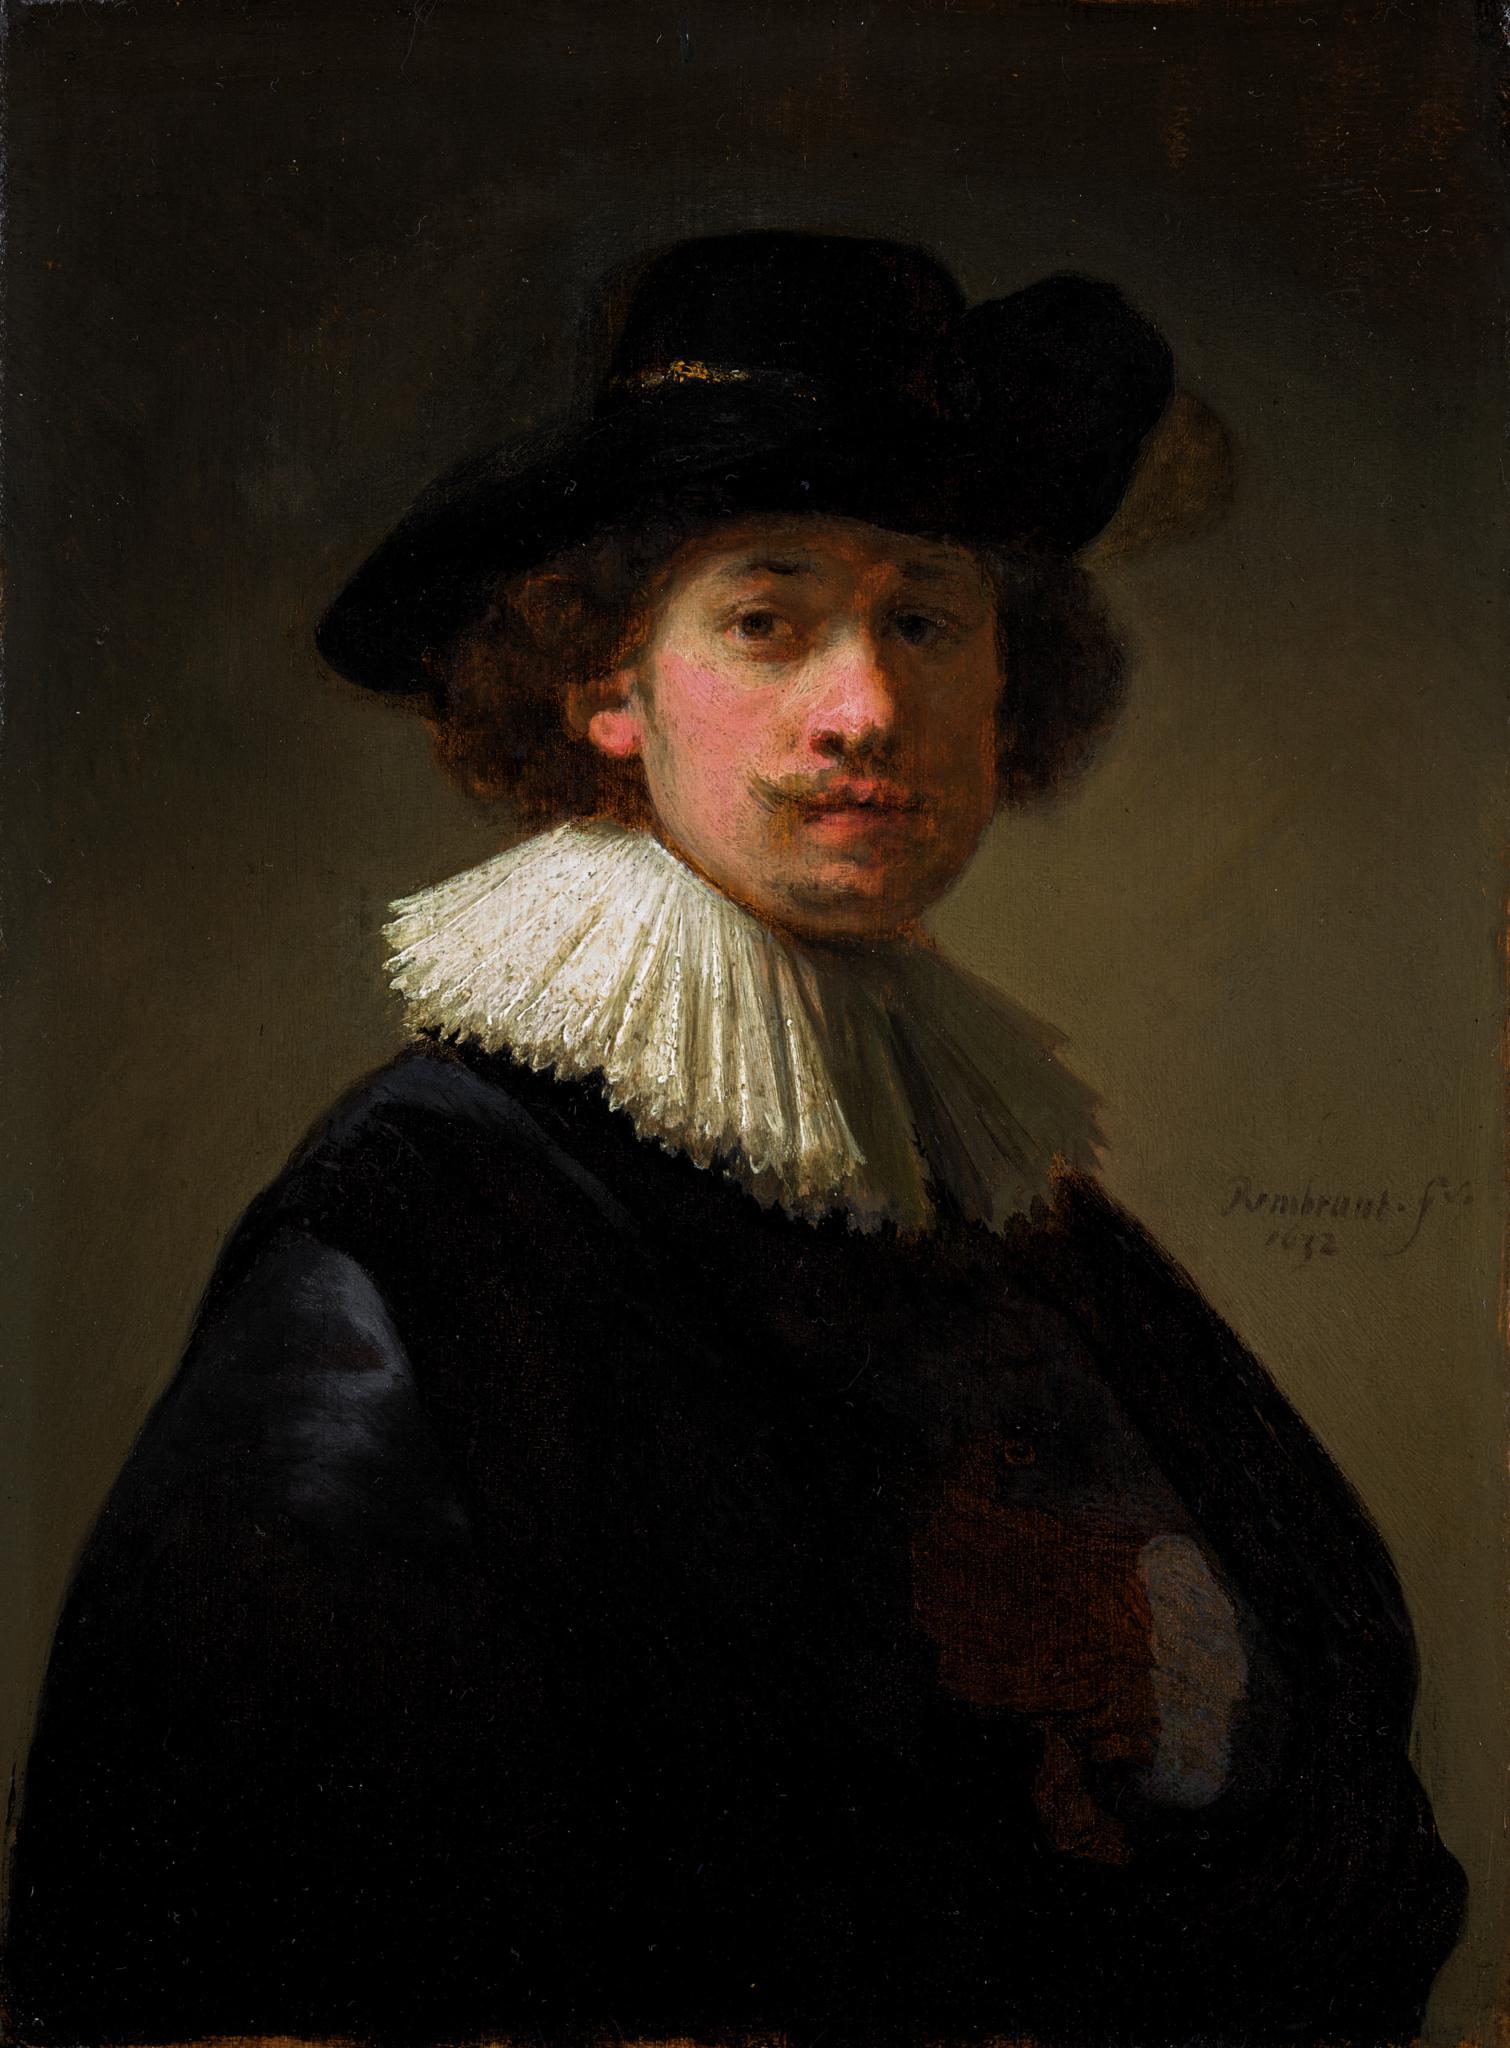 Rembrandt-Van-Rijn-Self-portrait-wearing-a-ruff-and-black-hat-1632-est.-£12-16-million-scaled-1510x2048-1